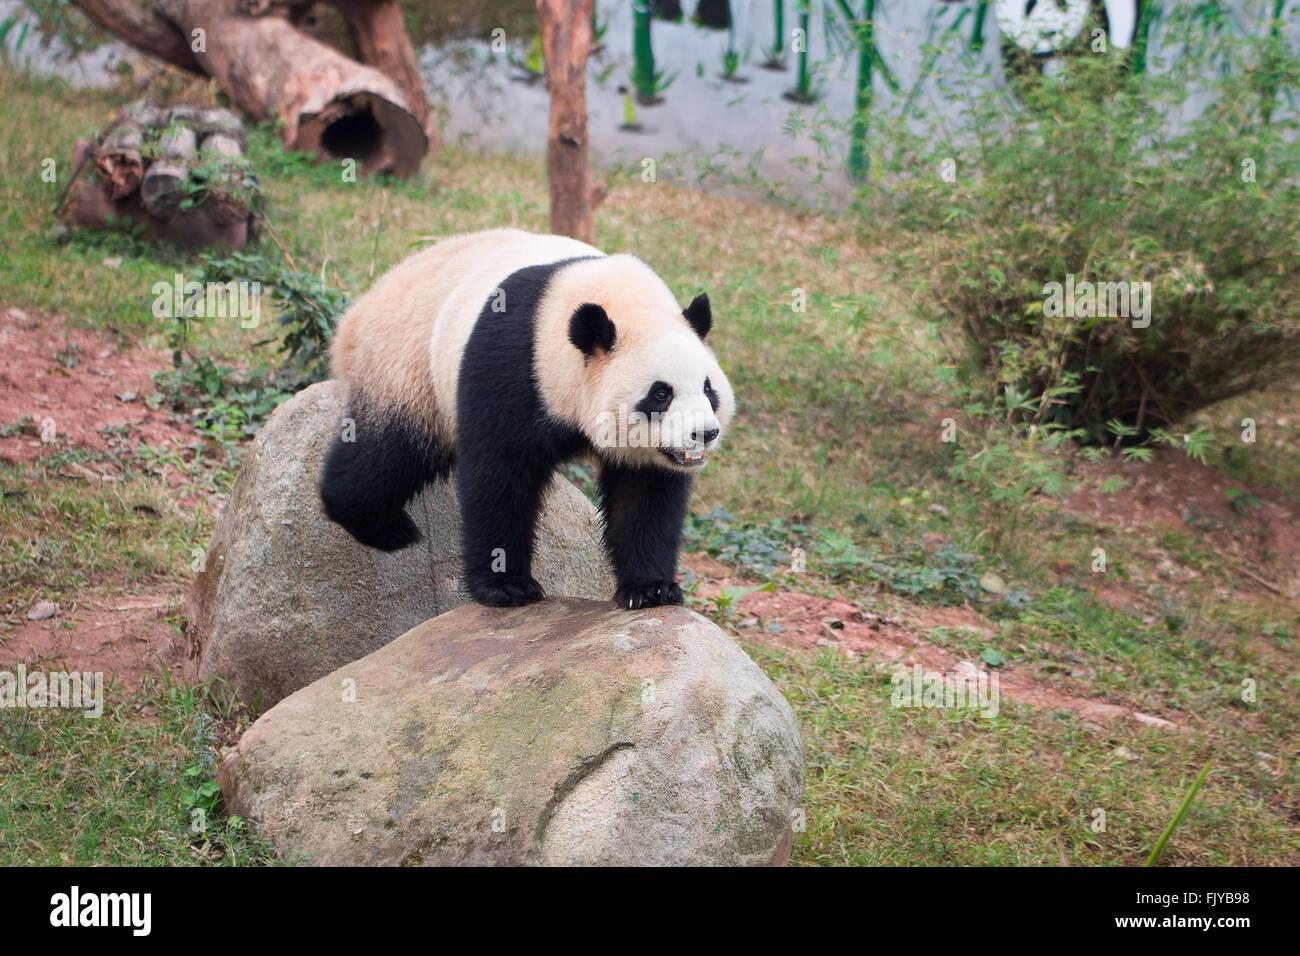 Panda au zoo Photo Stock